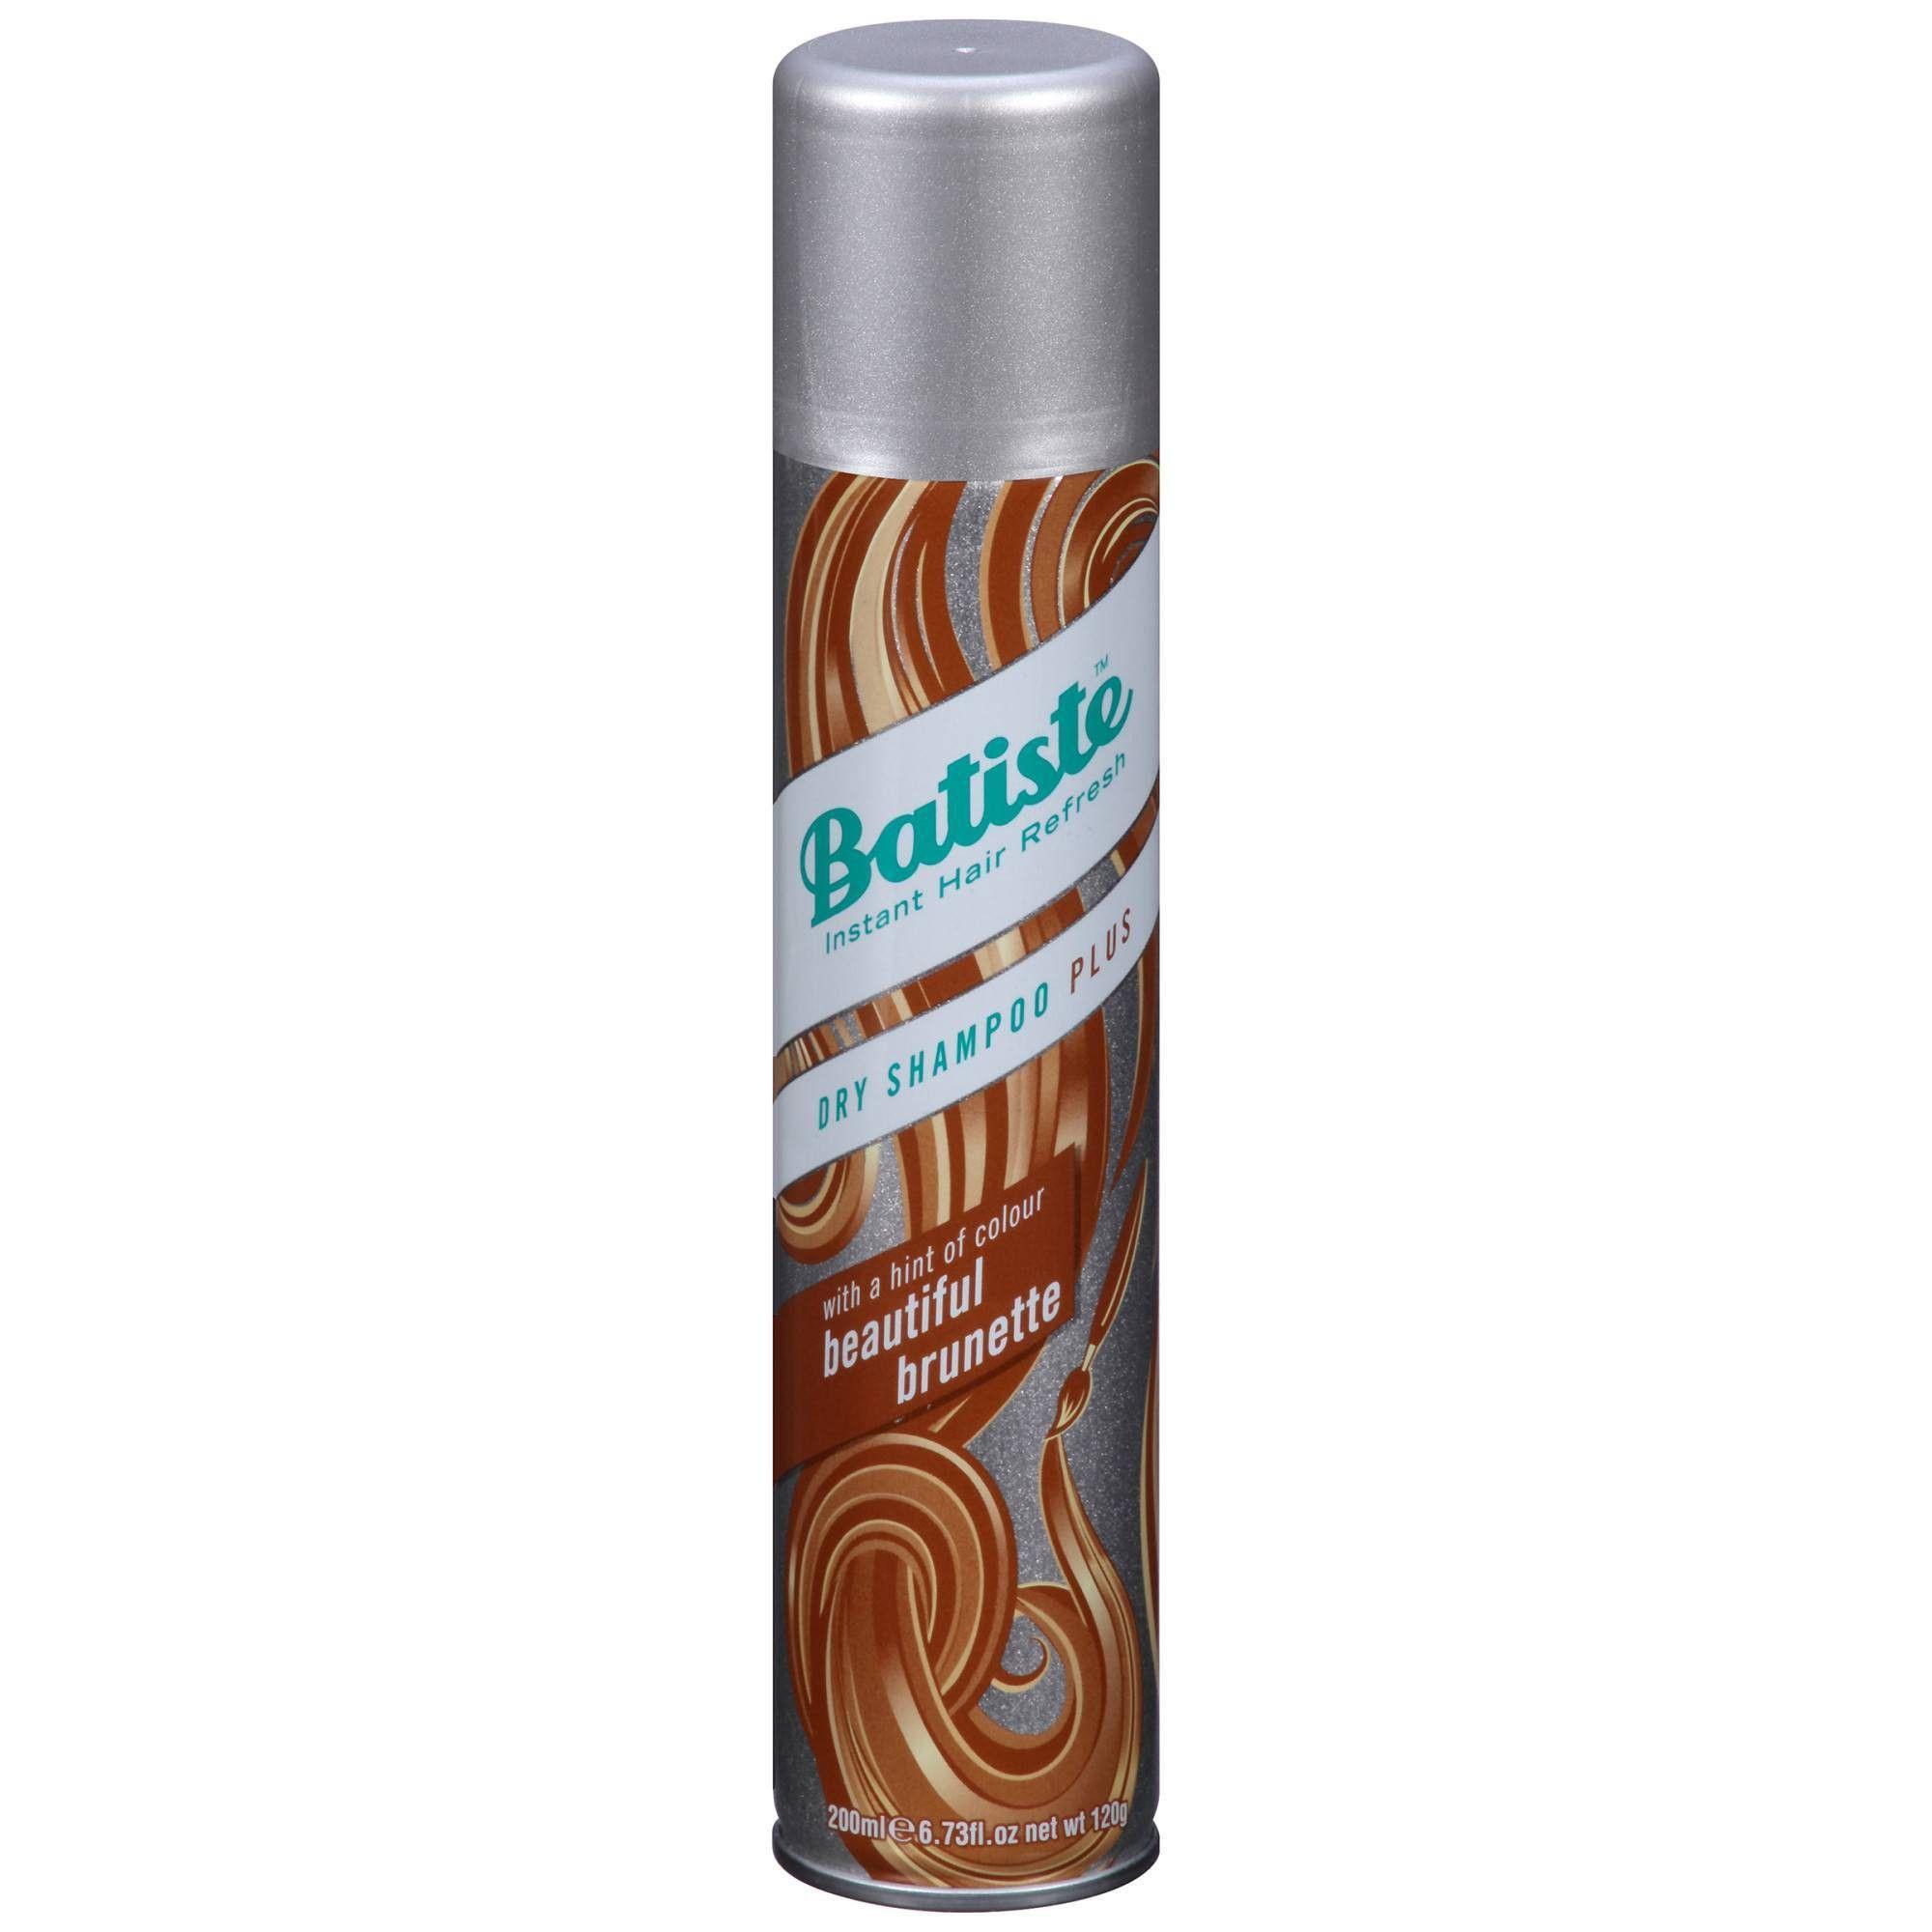 Batiste Hint Of Color Beautiful Brunette Dry Shampoo 6 73 Fl Oz Batiste Dry Shampoo Dry Shampoo Shampoo